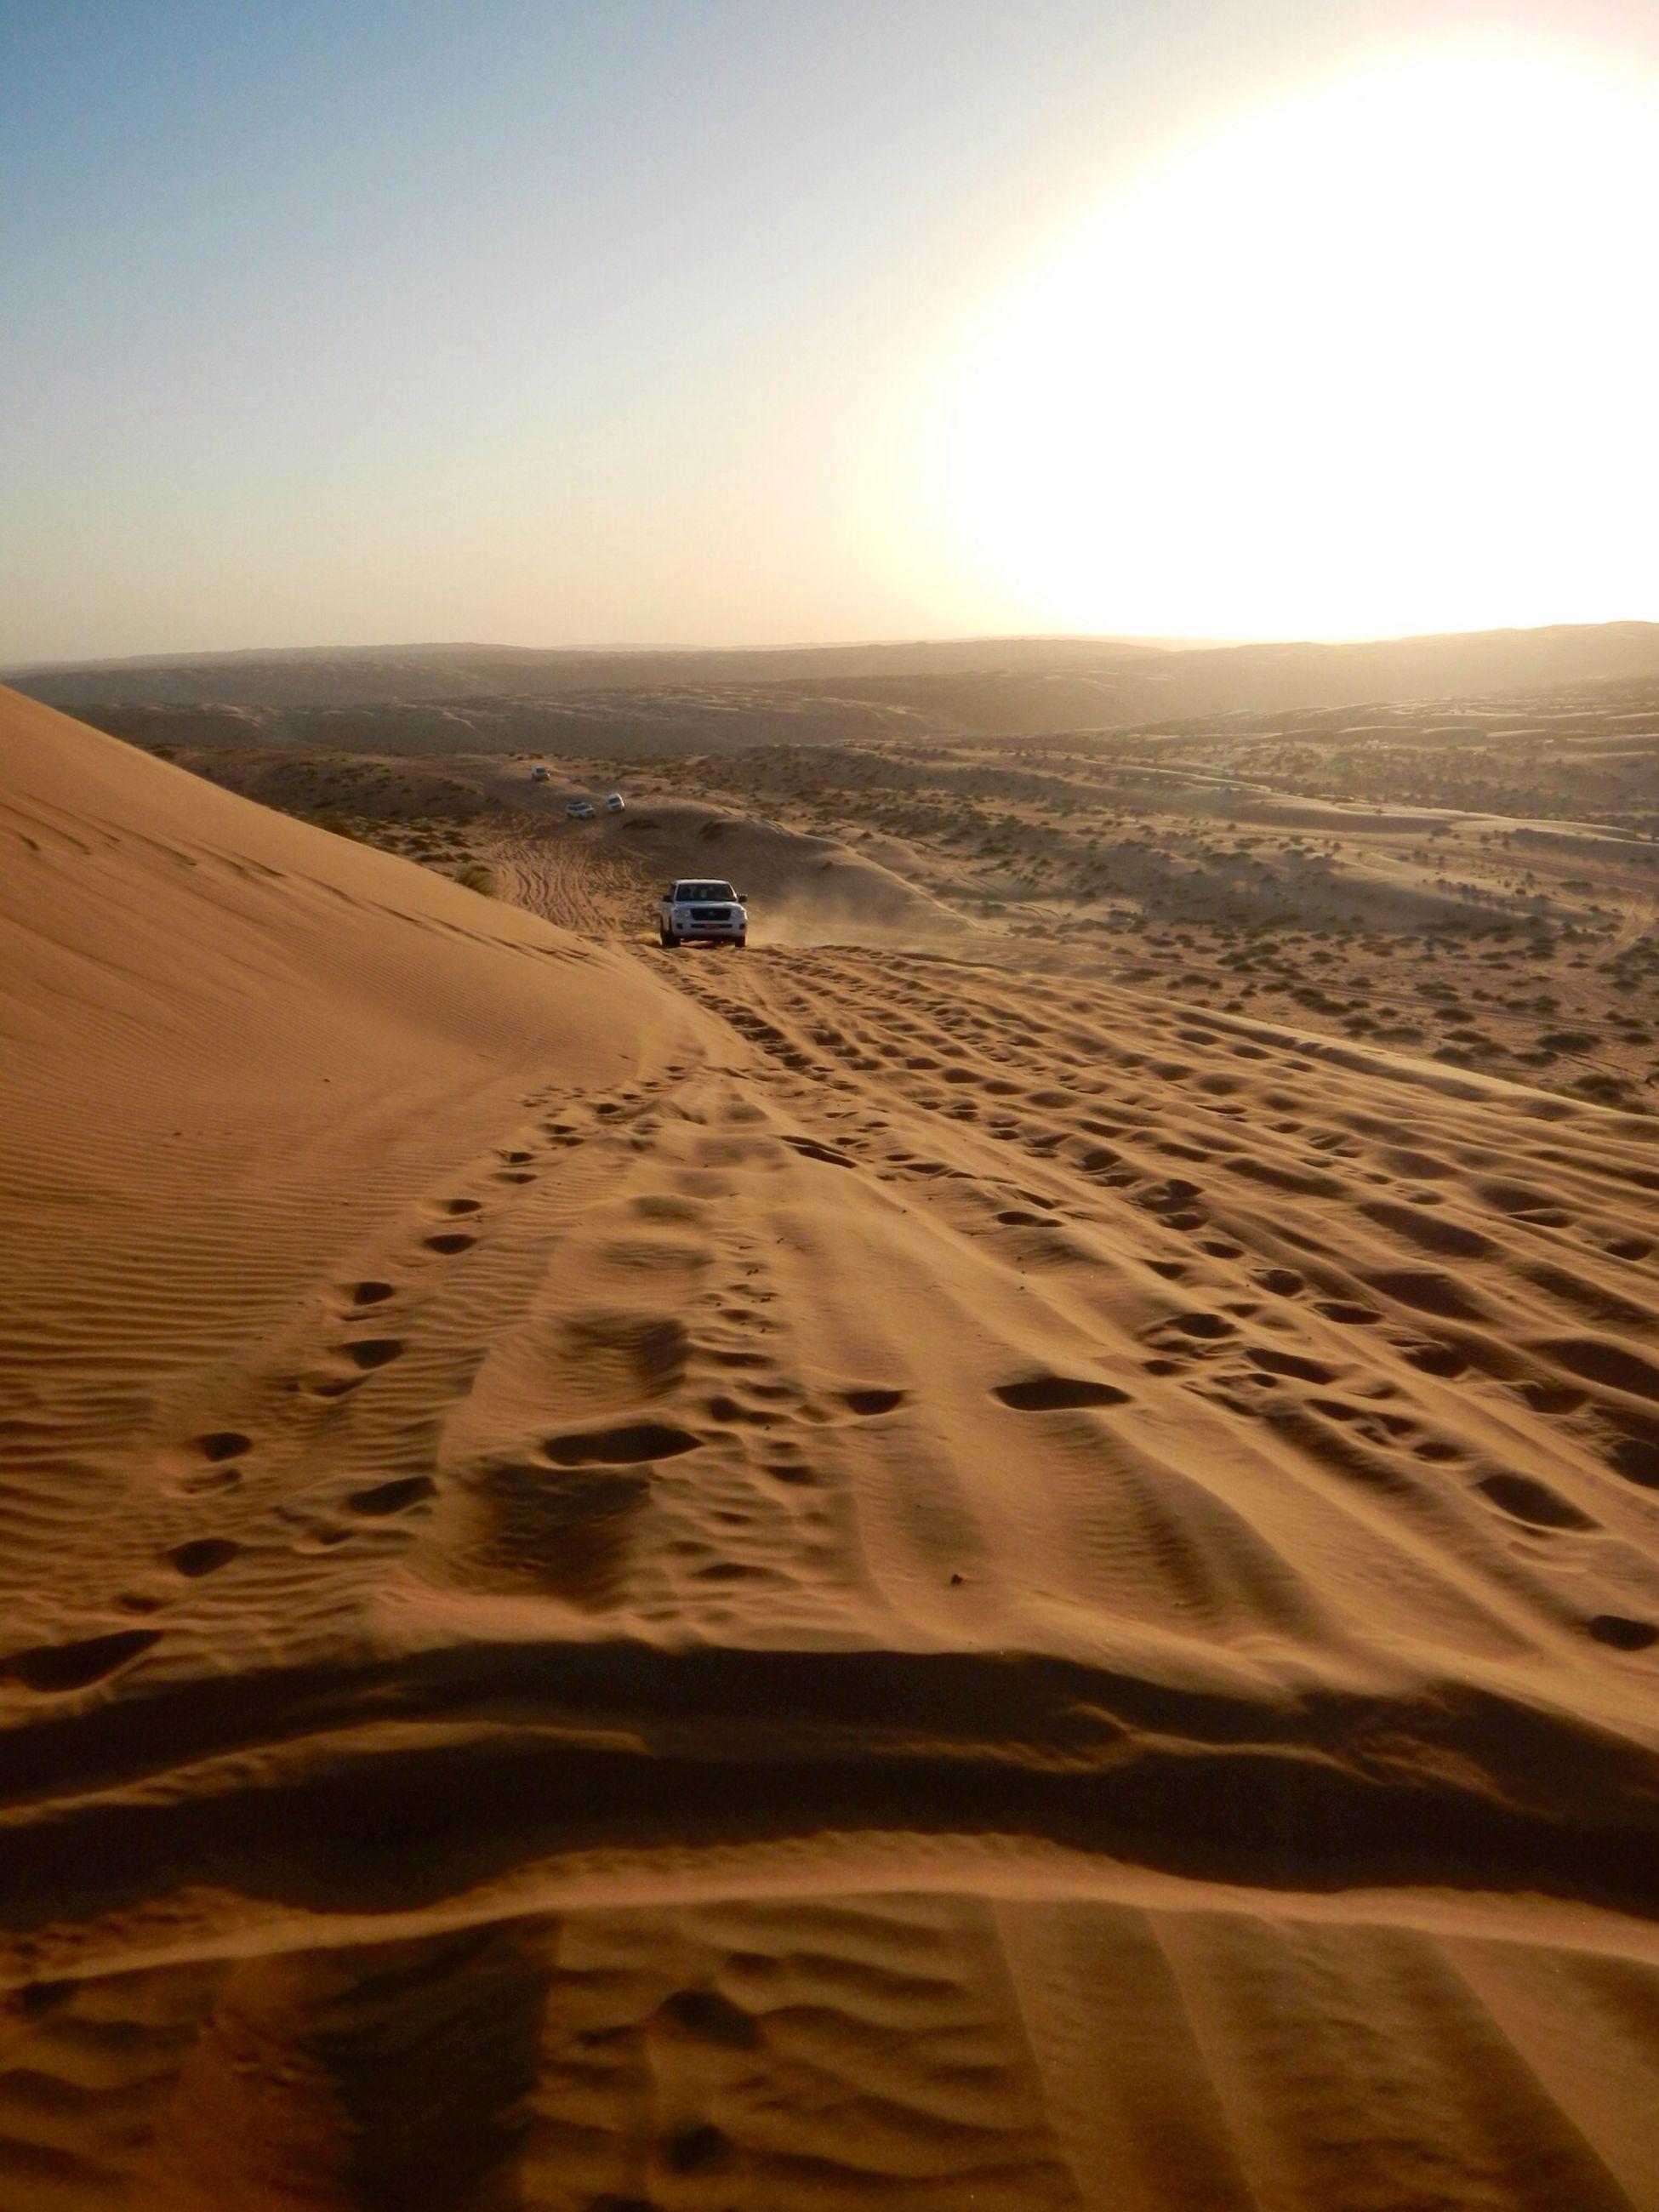 sand, sand dune, tranquil scene, tranquility, beach, desert, scenics, landscape, beauty in nature, nature, footprint, sunlight, arid climate, clear sky, sunset, sky, sun, horizon over land, idyllic, sea